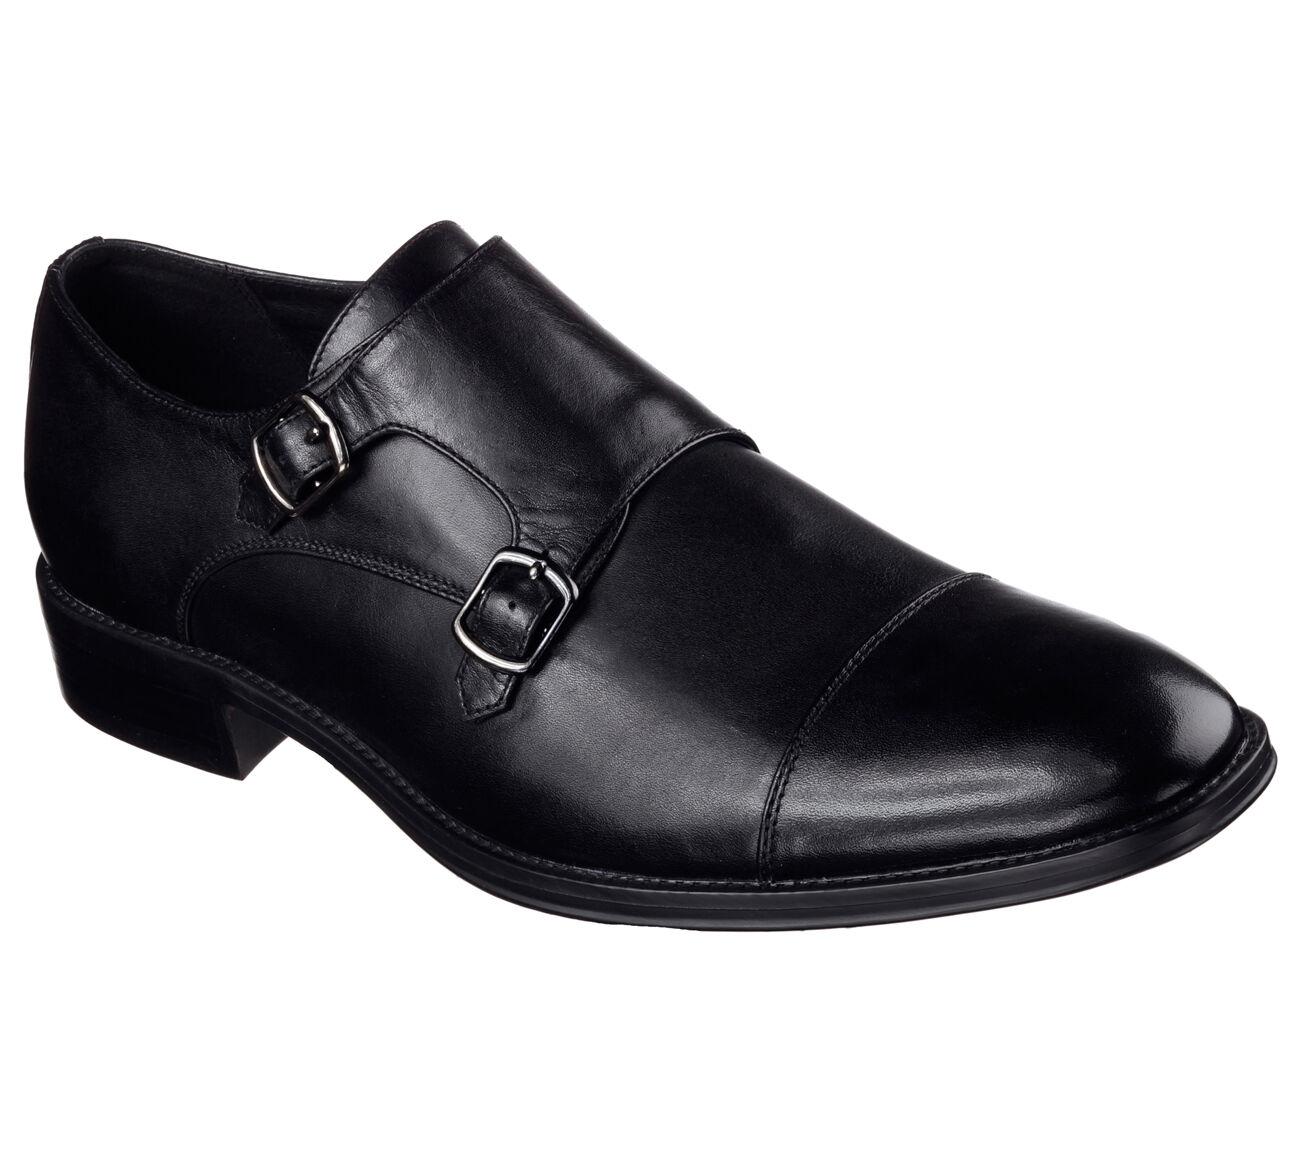 Men's MARK NASON by SKECHERS Wickman Oxford, 68913 /BLK Sizes 8-13 Black